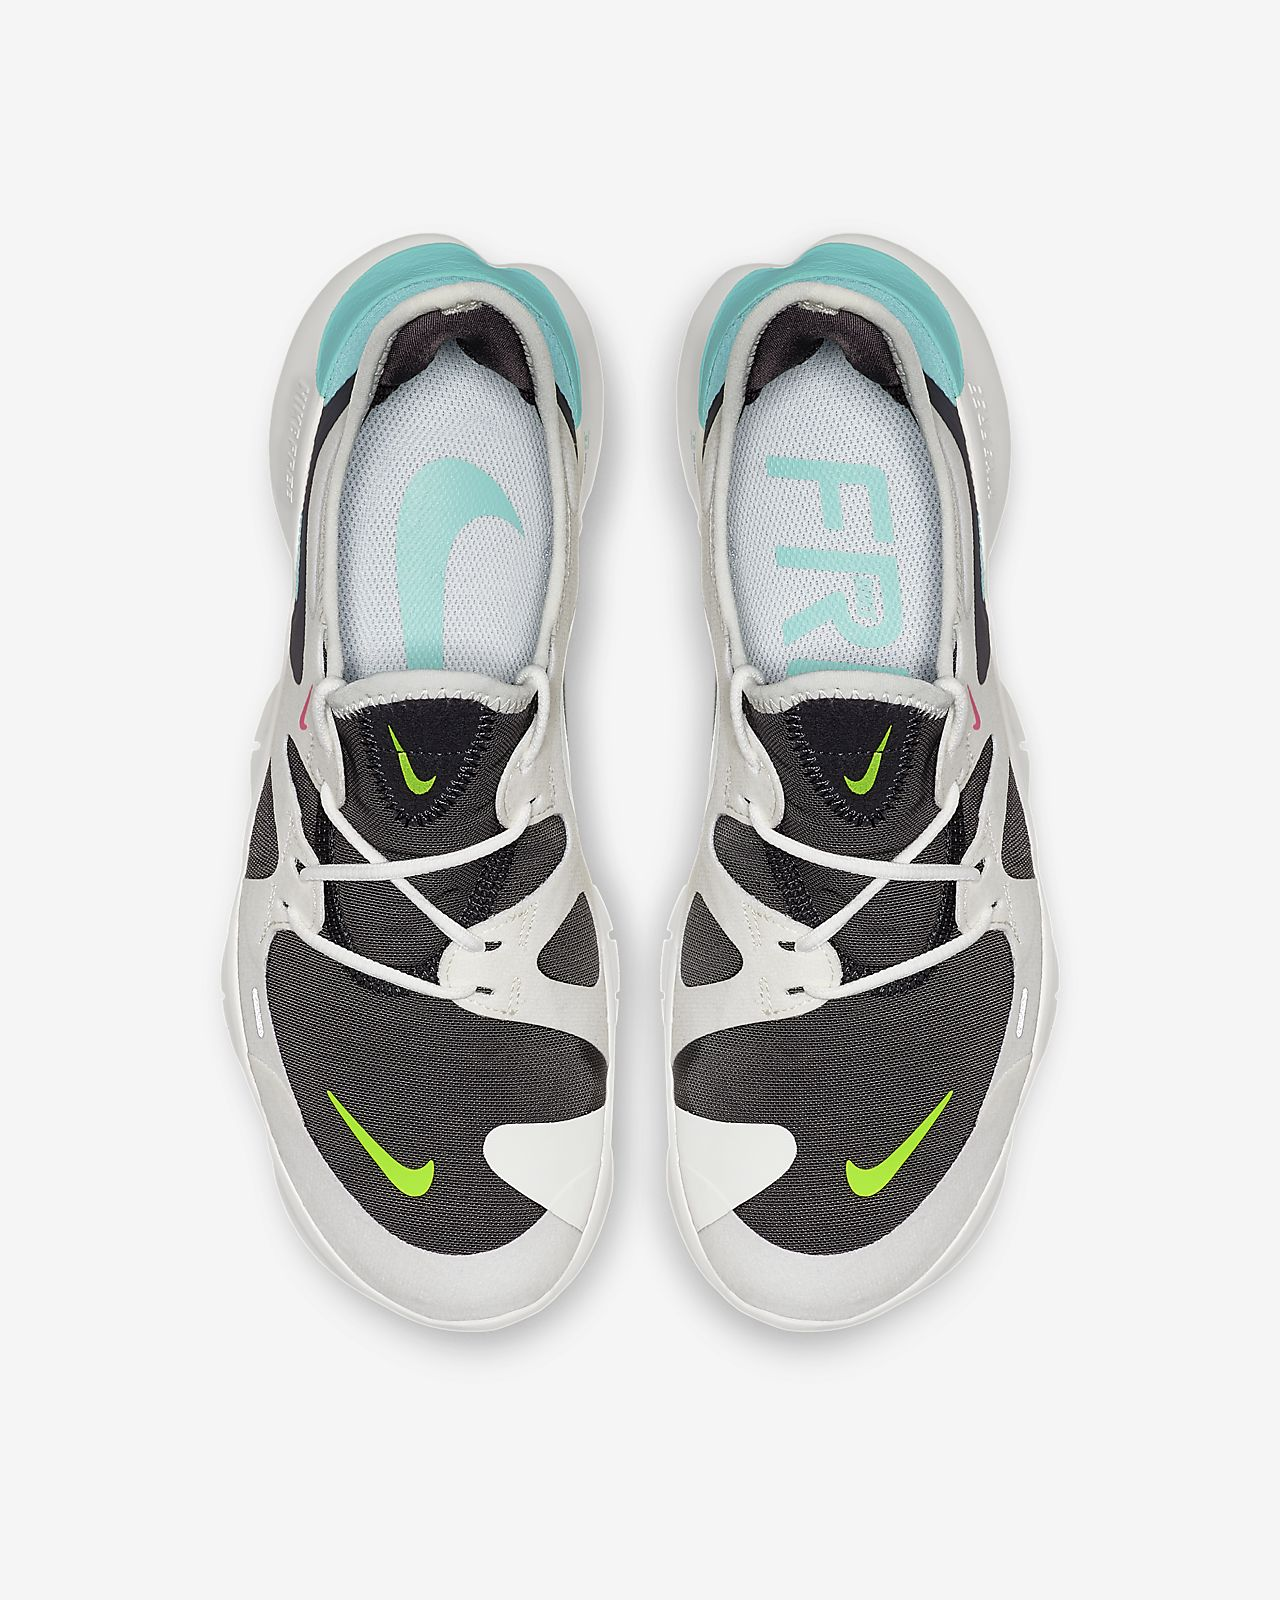 a86691bd1f19 Nike Free RN 5.0 női futócipő. Nike.com HU